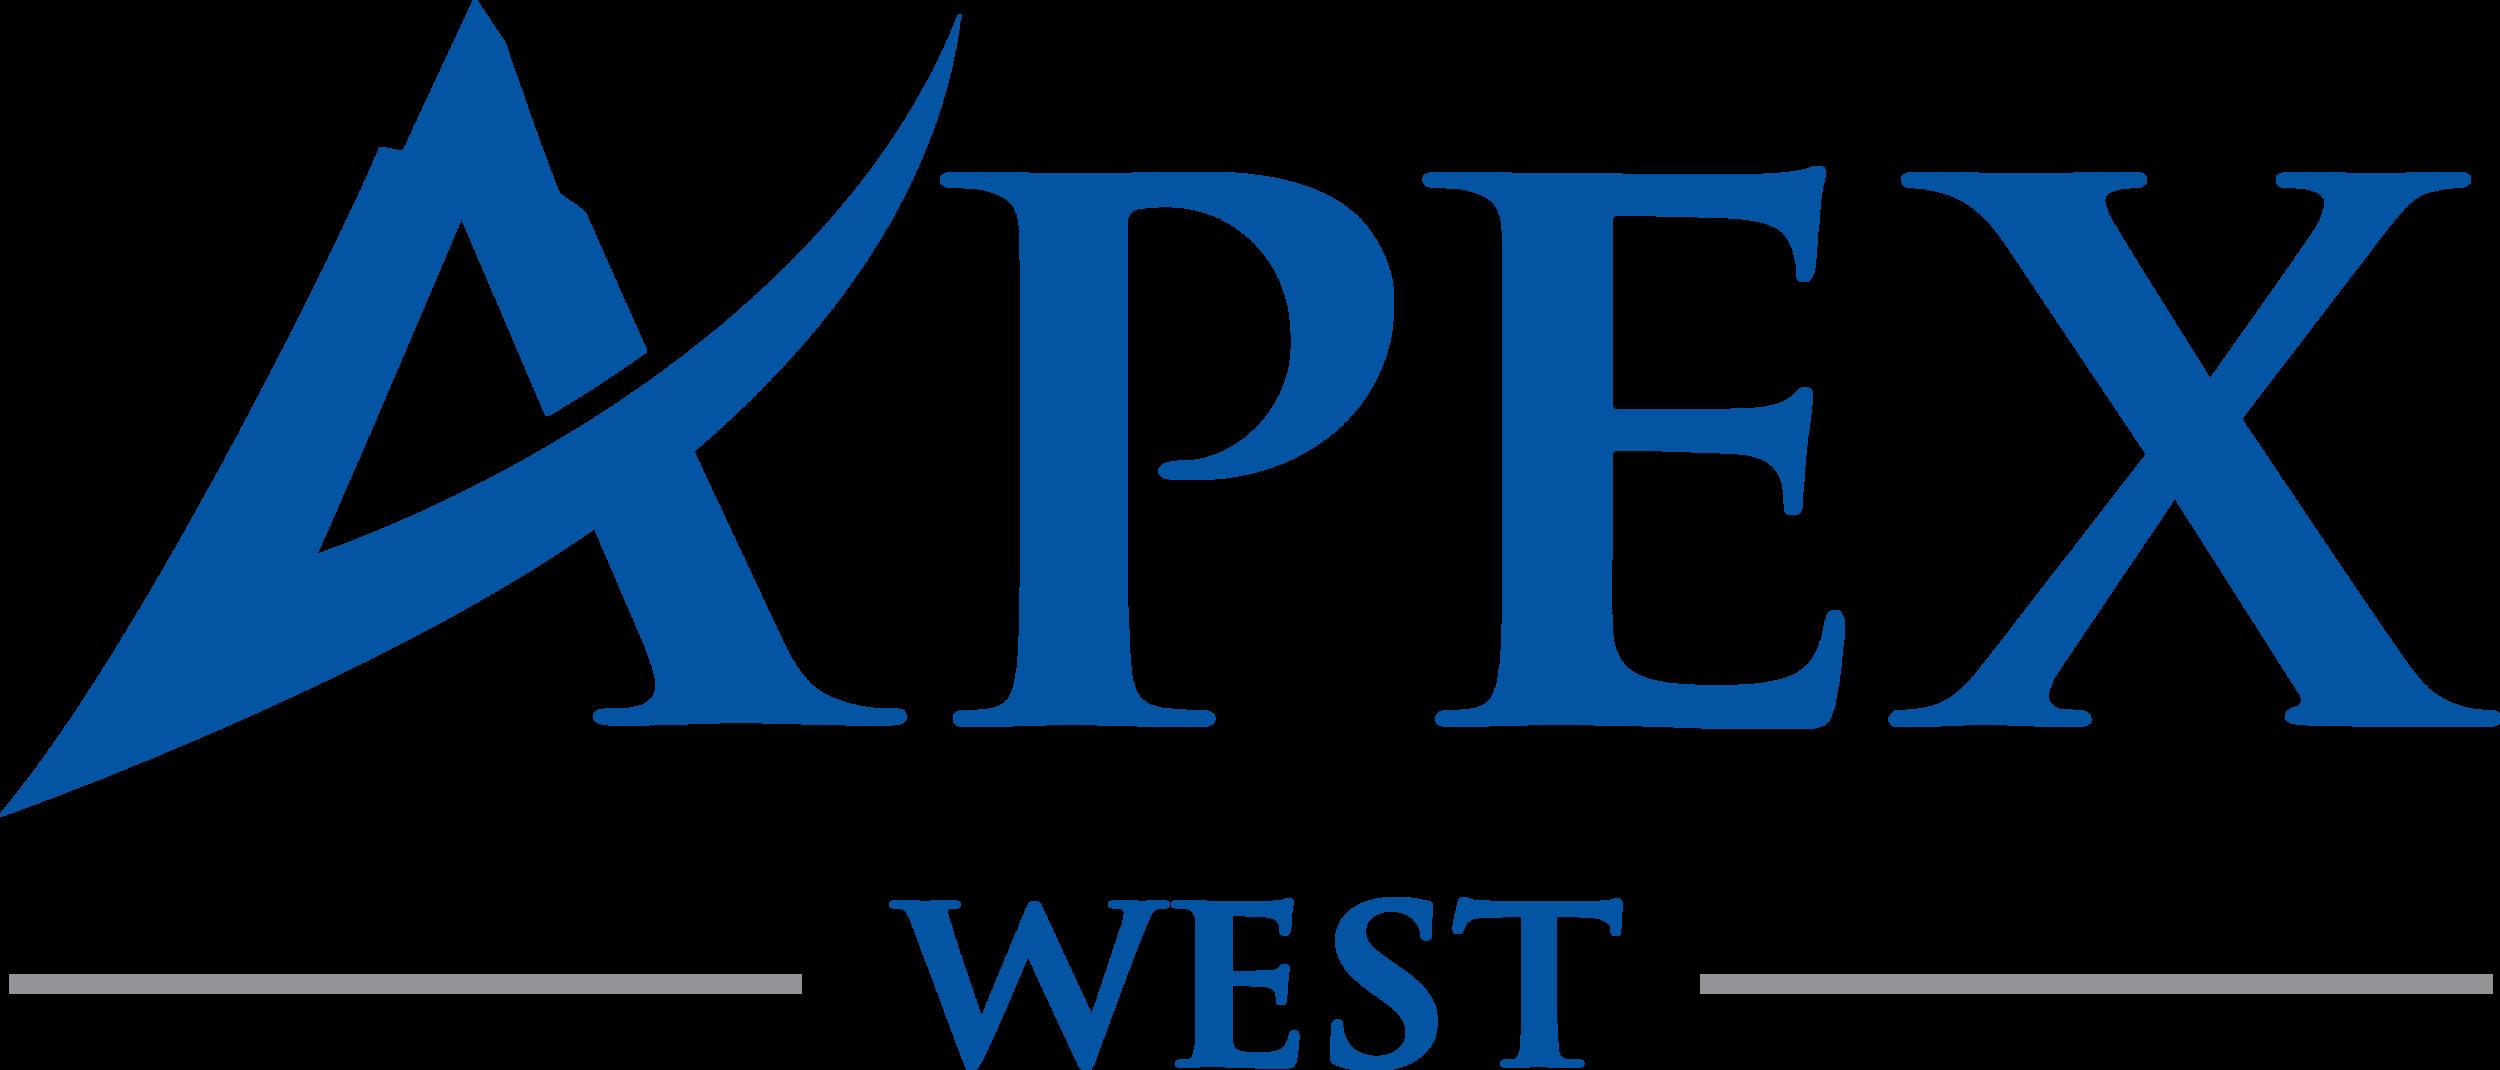 Apex West_Final logo.png